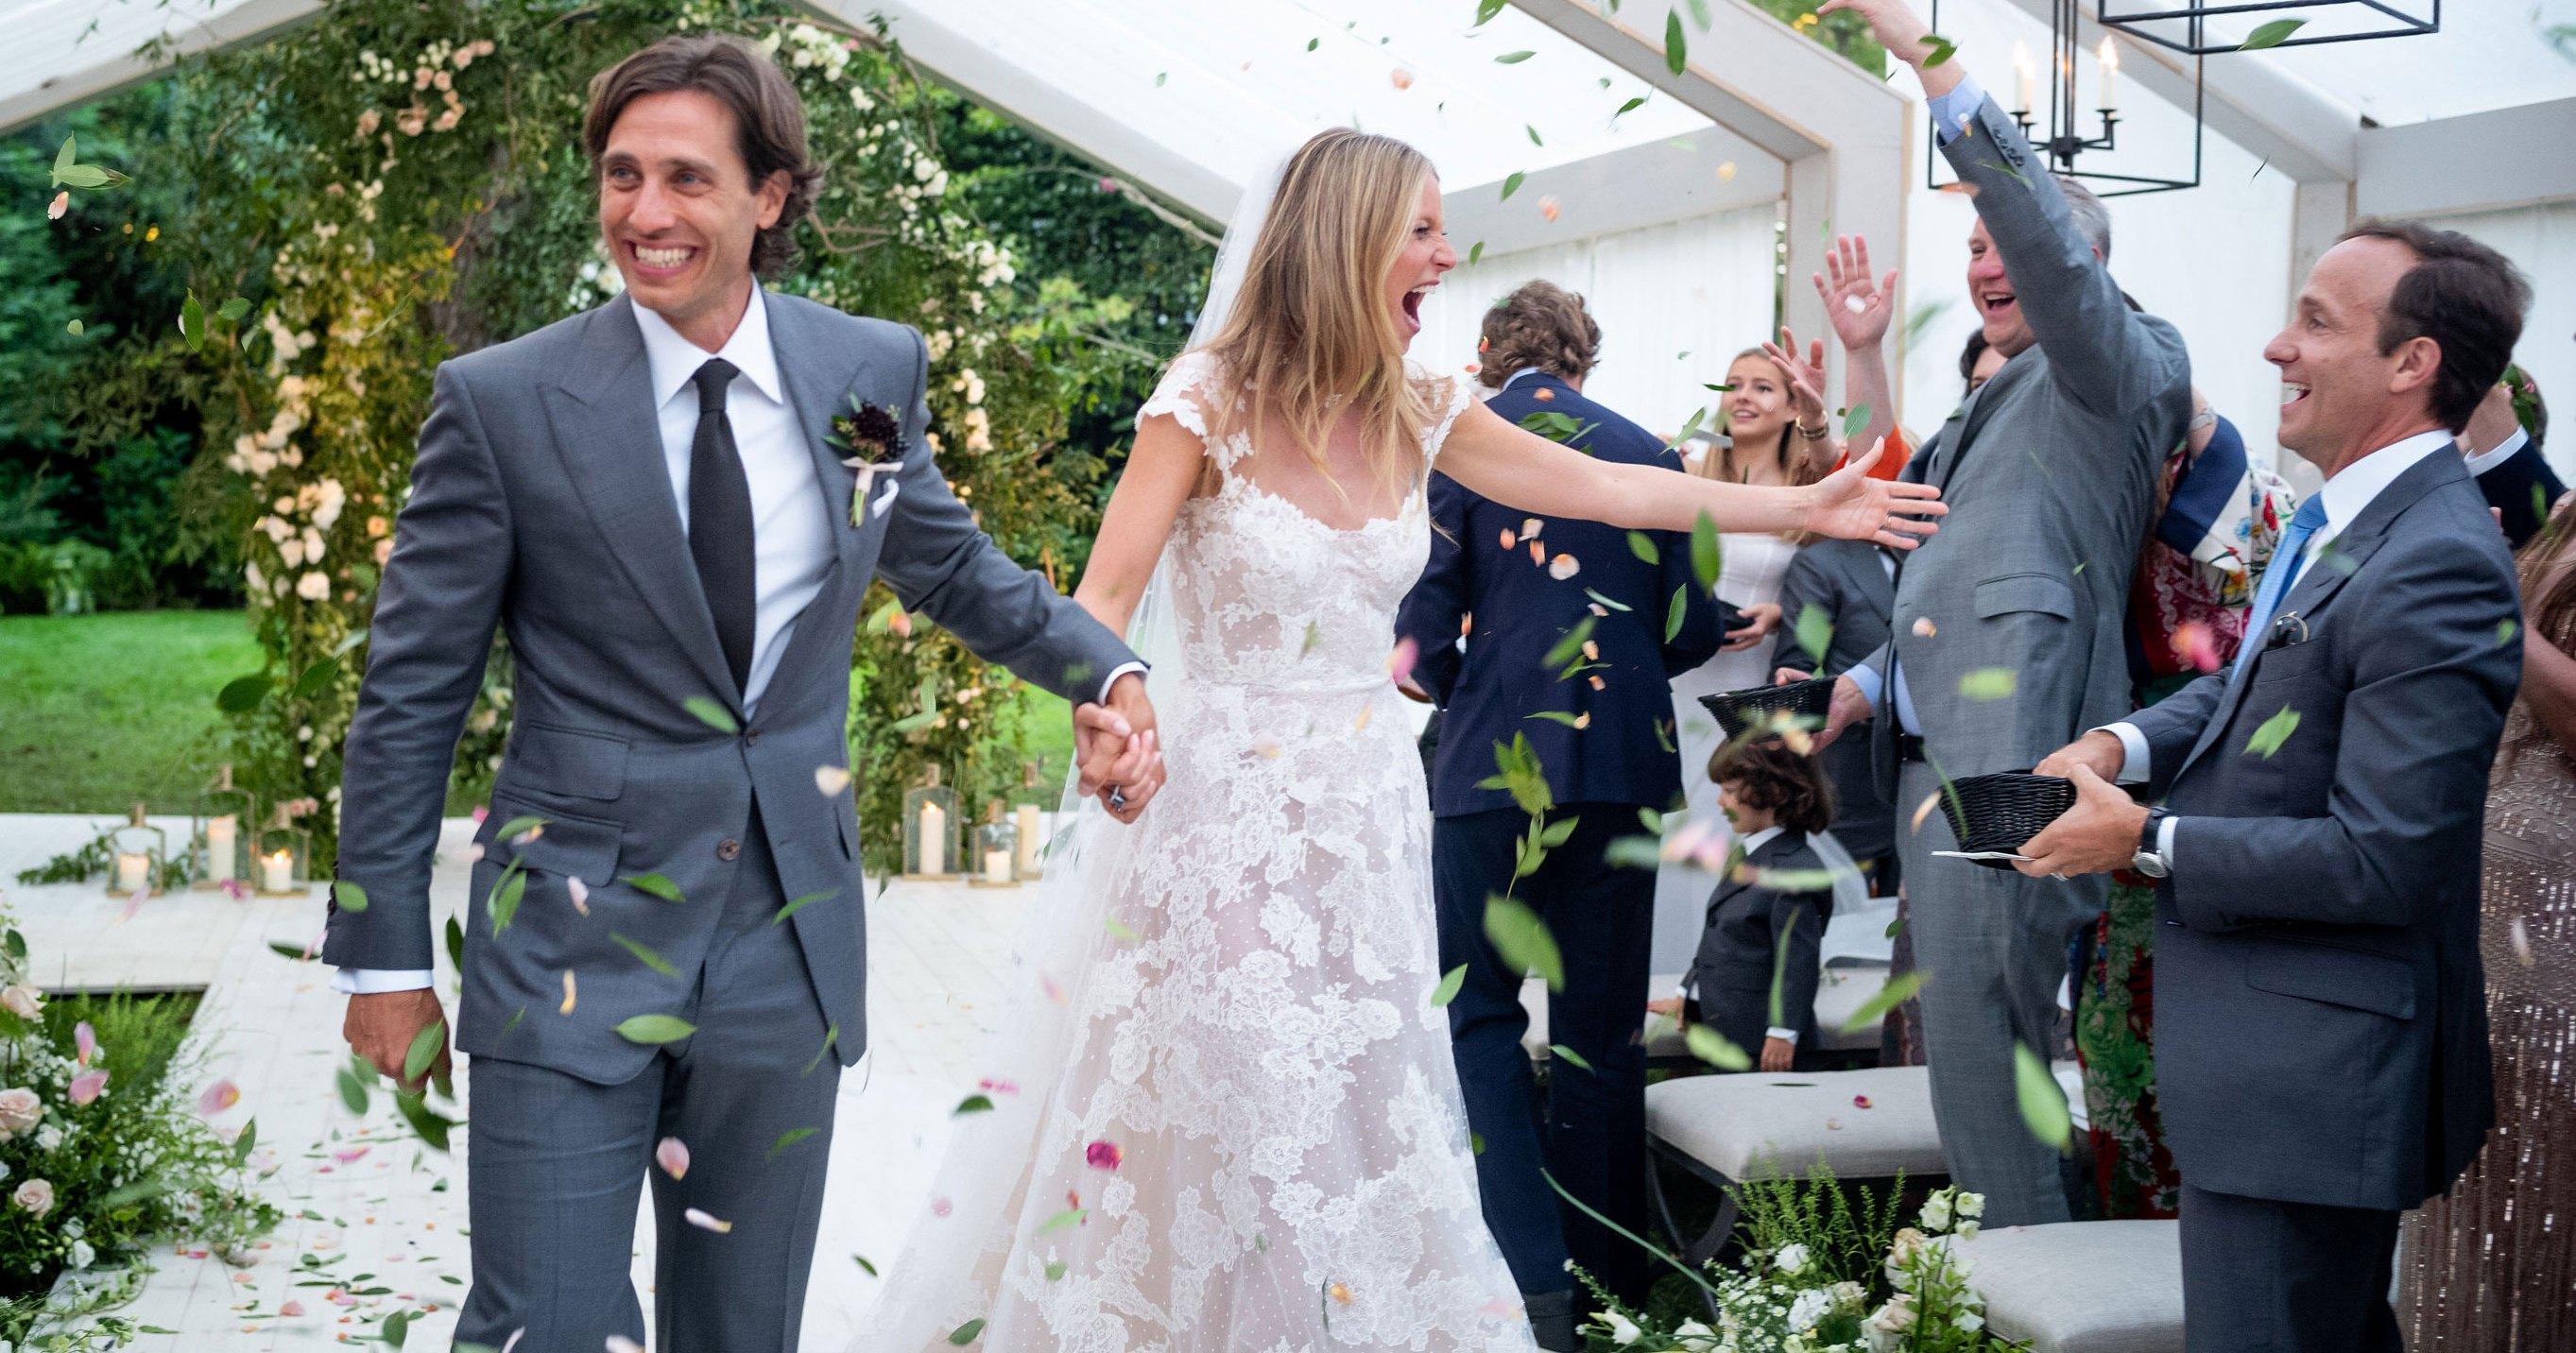 Gwyneth Paltrow Wowed in a Valentino Wedding Gown to Marry Brad Falchuk